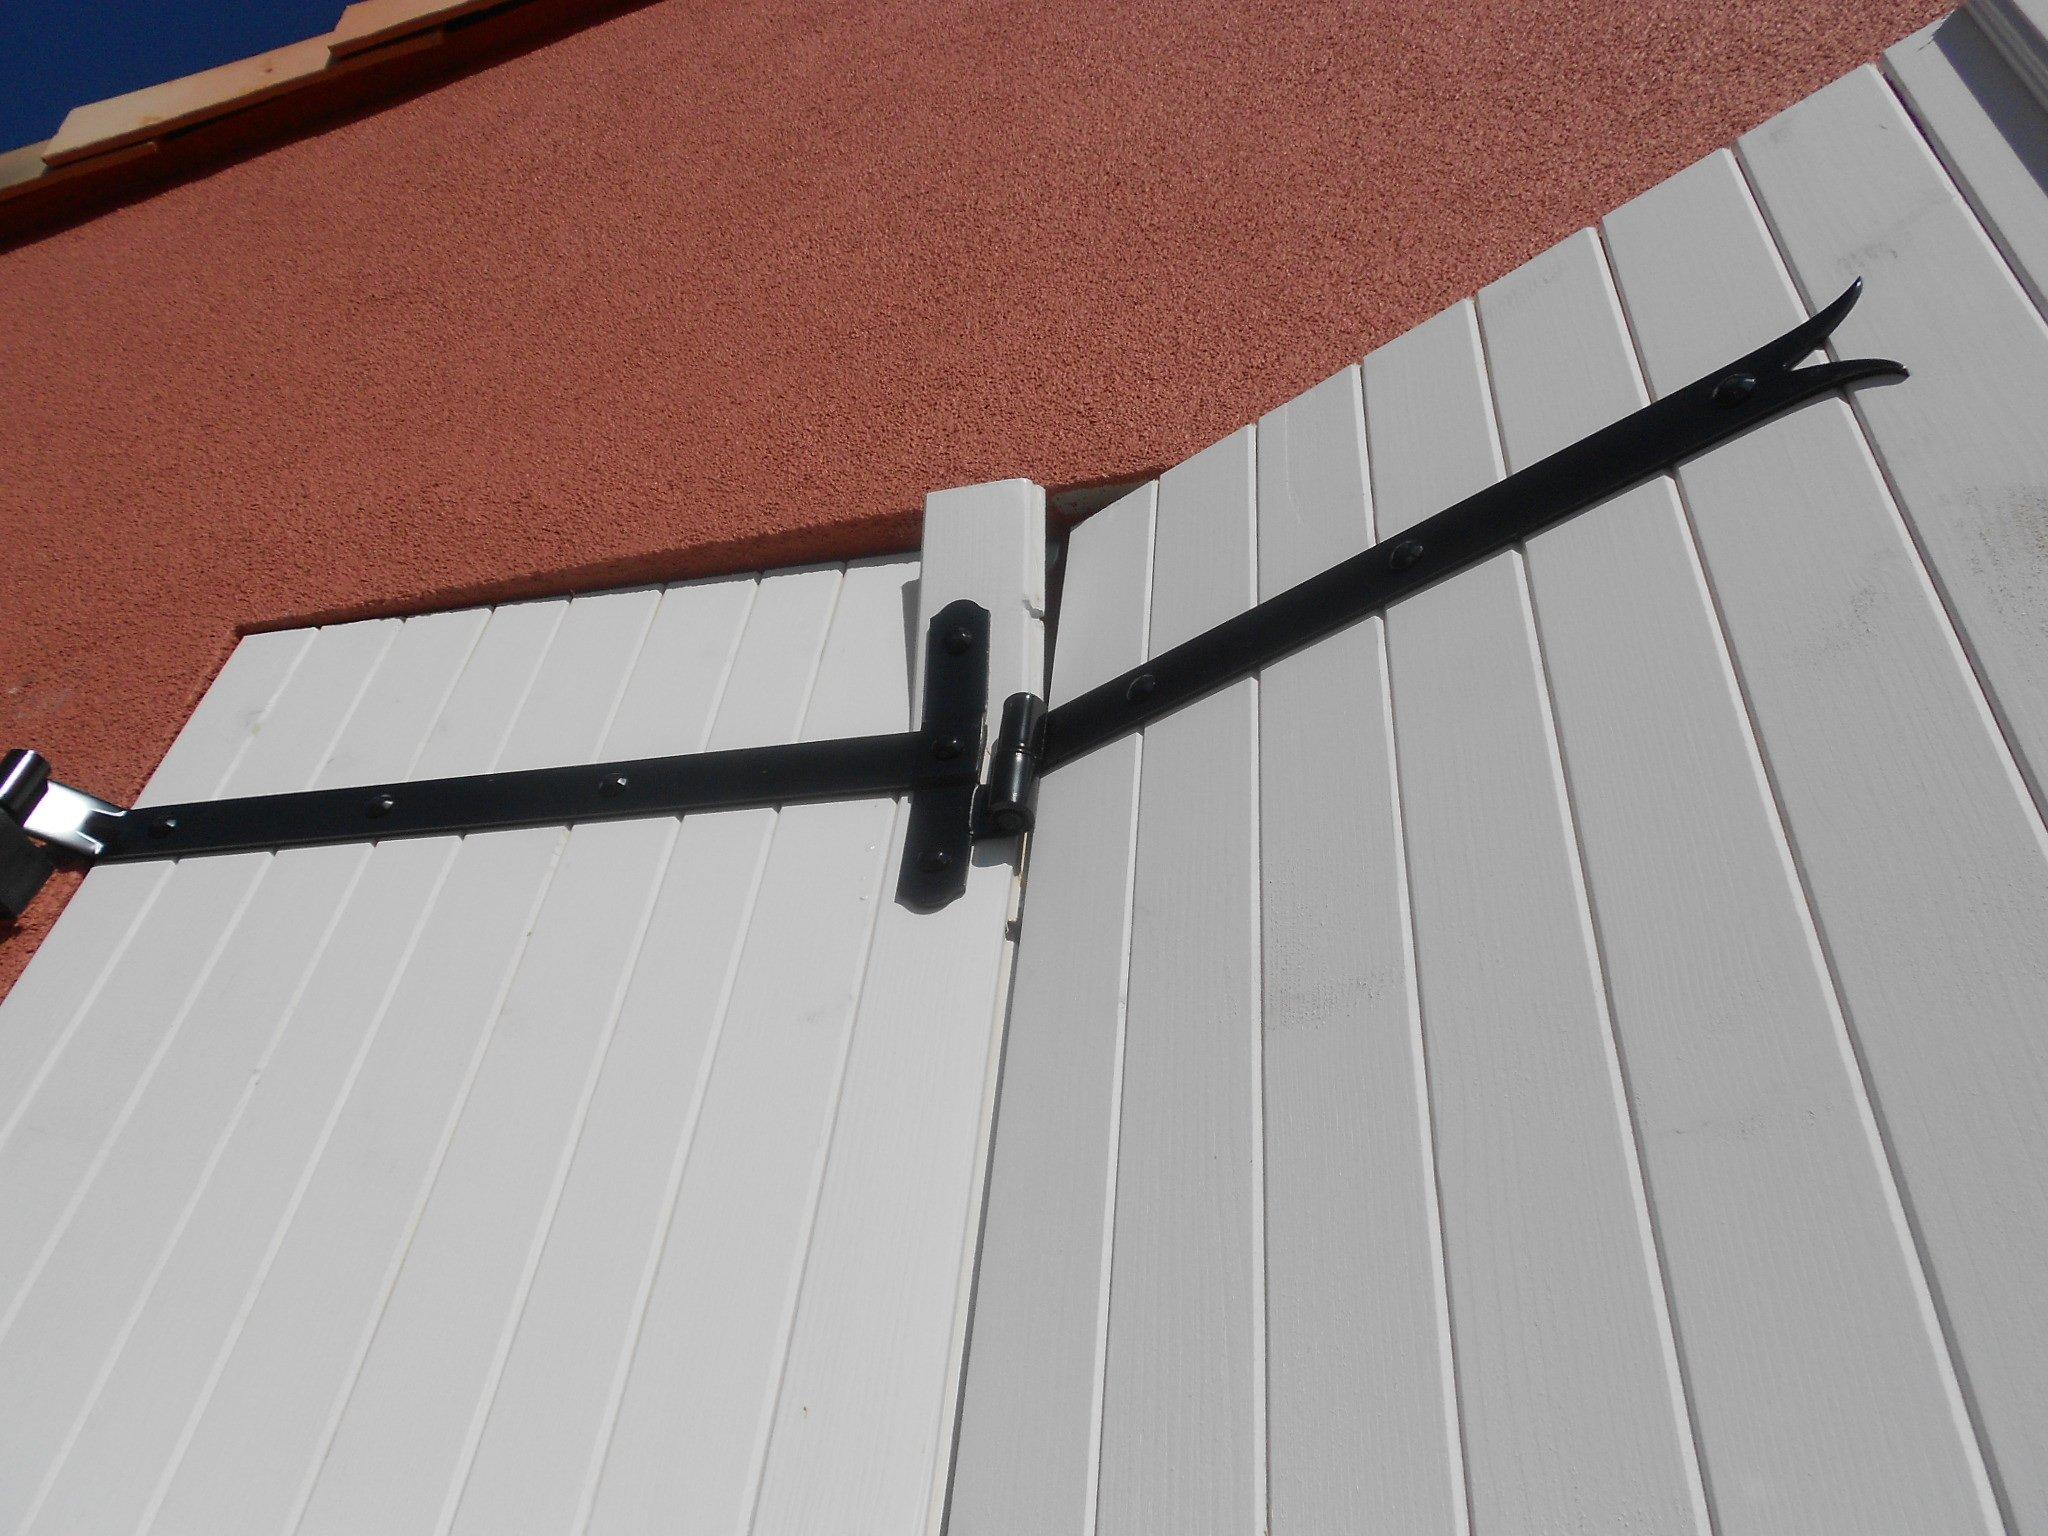 Changer fenetre maison phenix installer une baie vitre for Installer une fenetre pvc